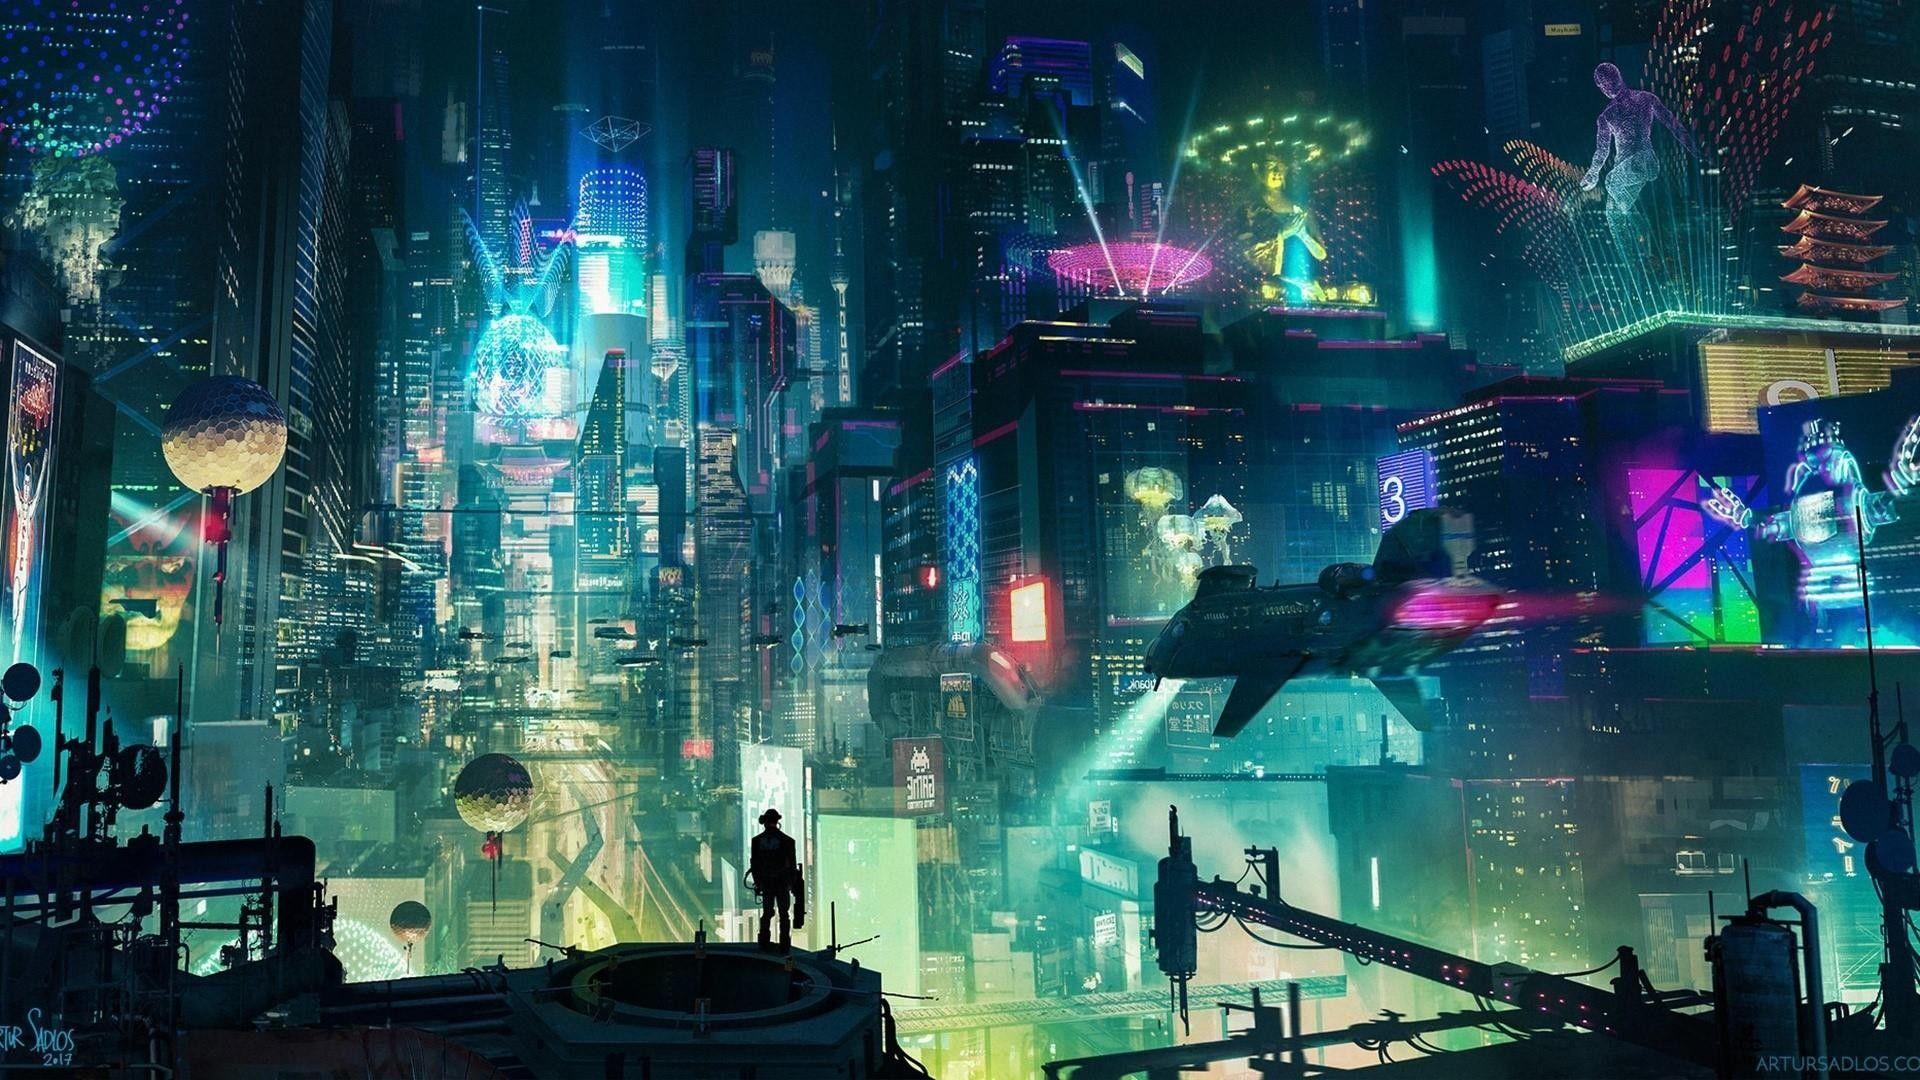 Res 1920x1080 Cyberpunk City Oboi Studiya Oboev 10 Desyatki Tysyach Hd I Ultrahd Oboev Dlya Android Windows I Xbox Artur Cyberpunk Memes